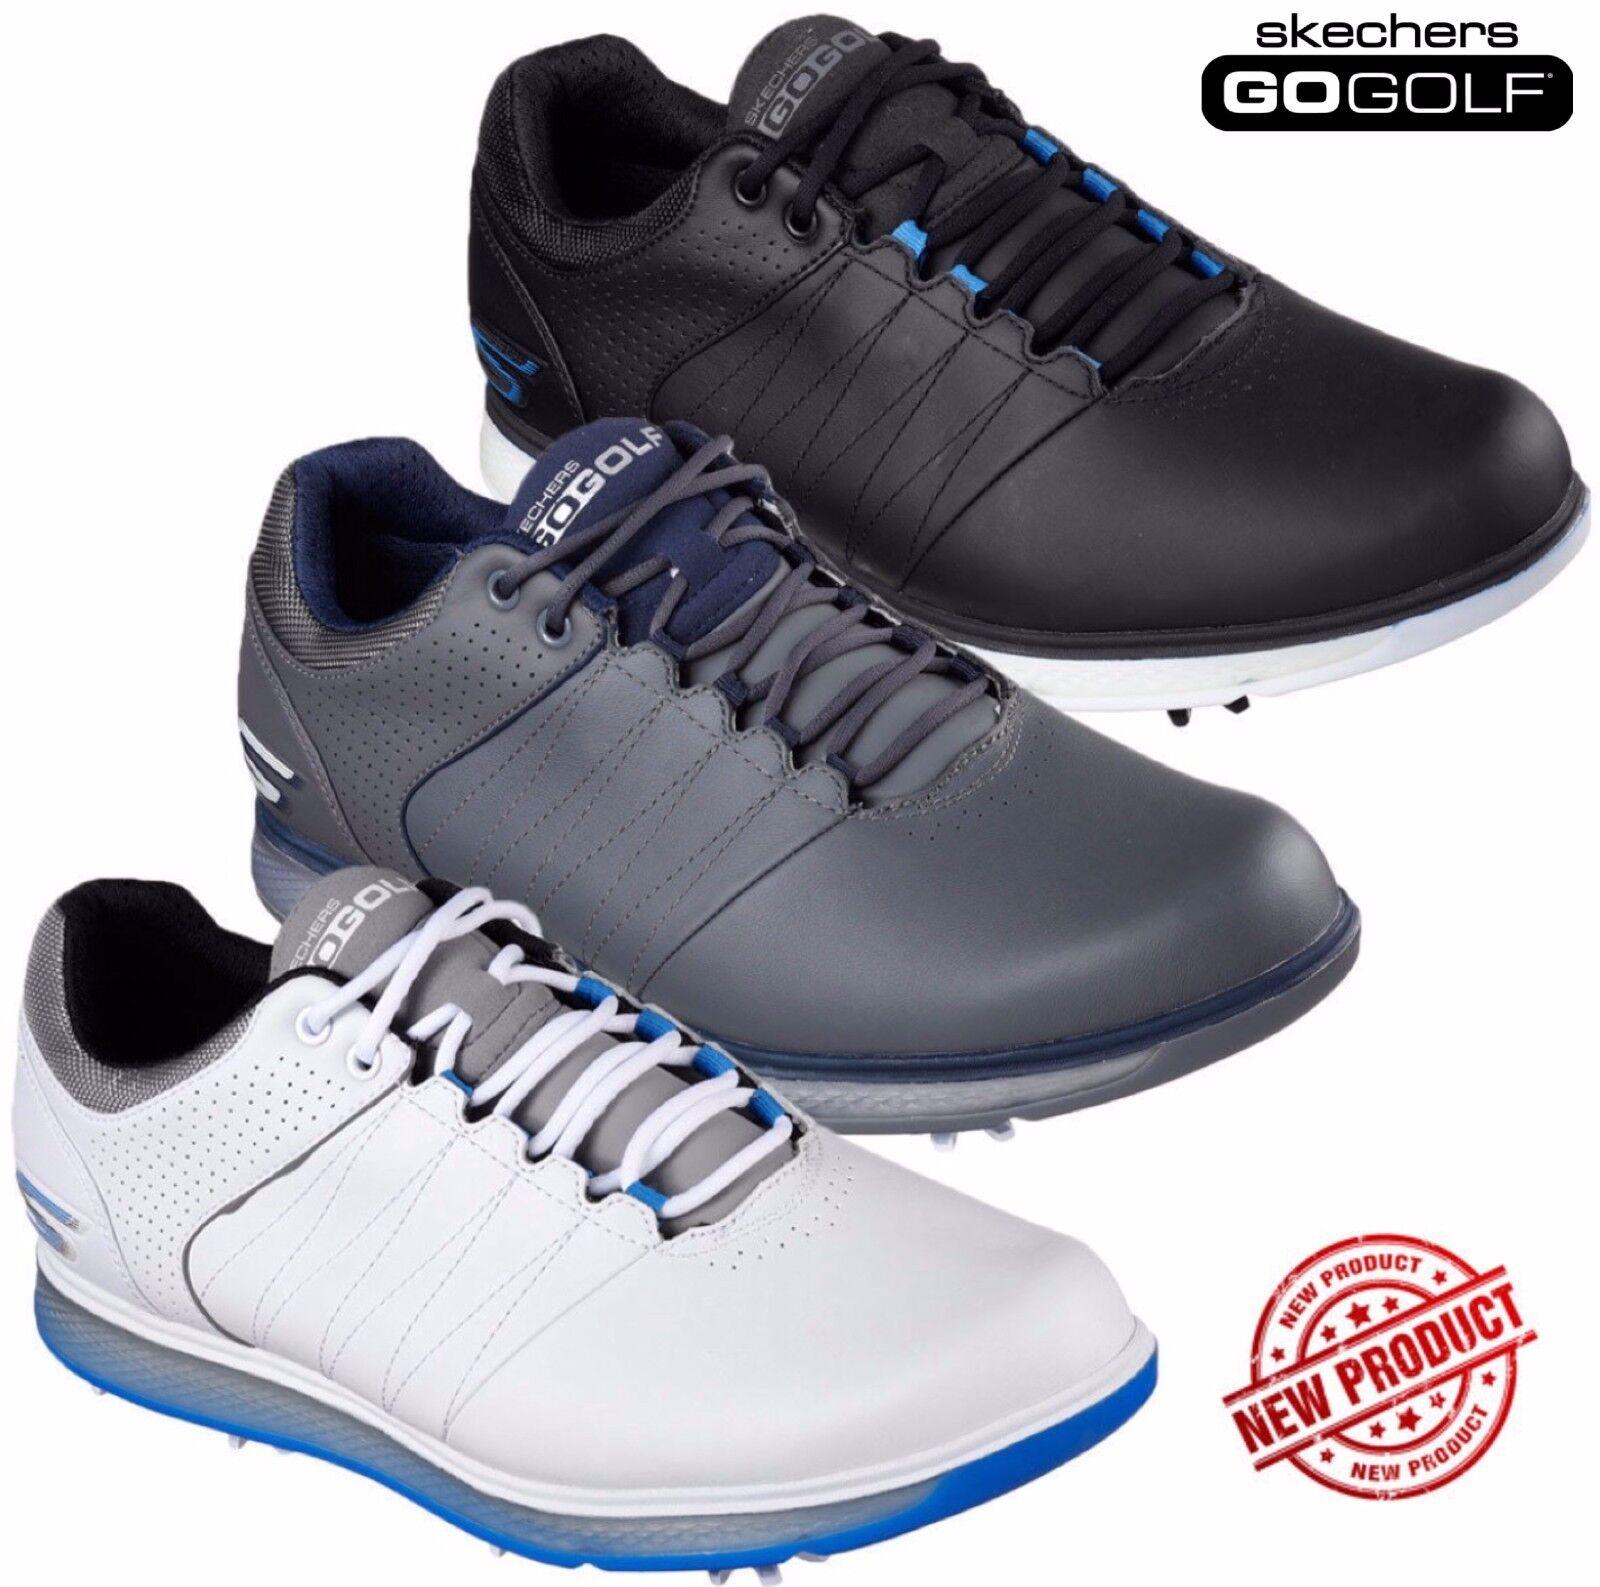 Skechers GO Golf PRO 2 Spiked